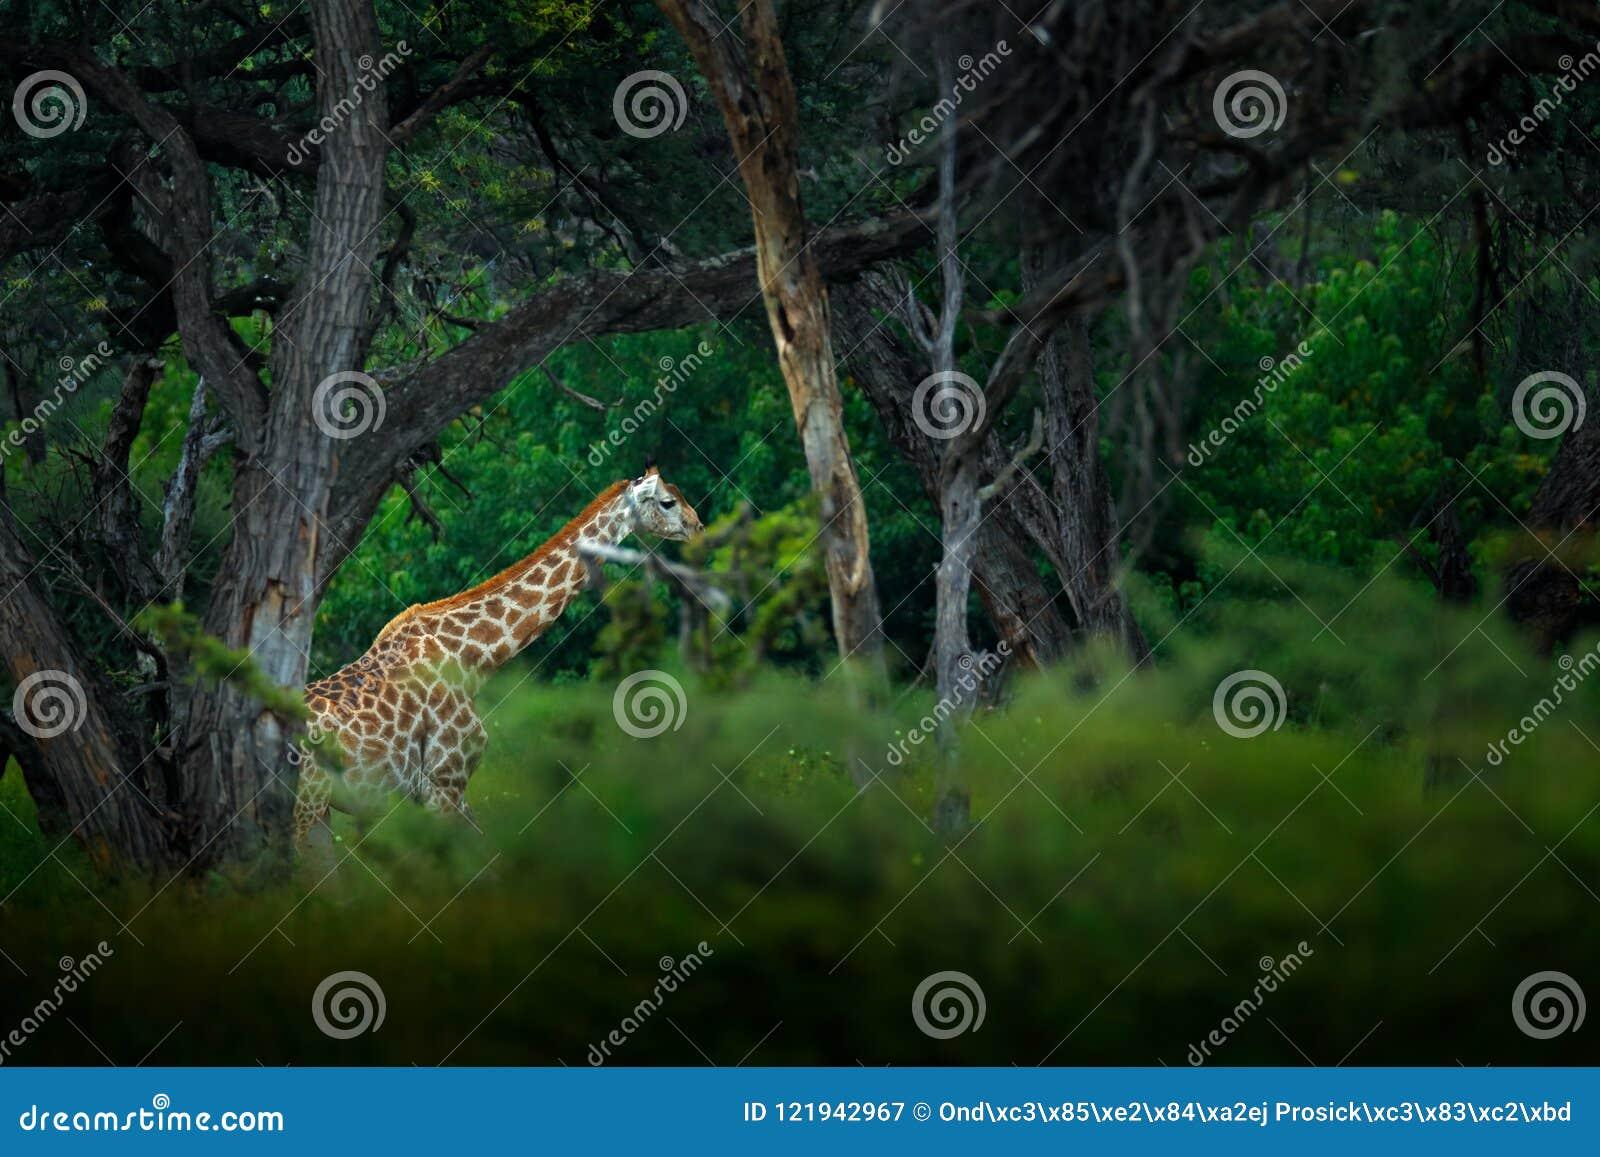 Giraffe In Big Tree Forest Habitat Landscape With Big Animal